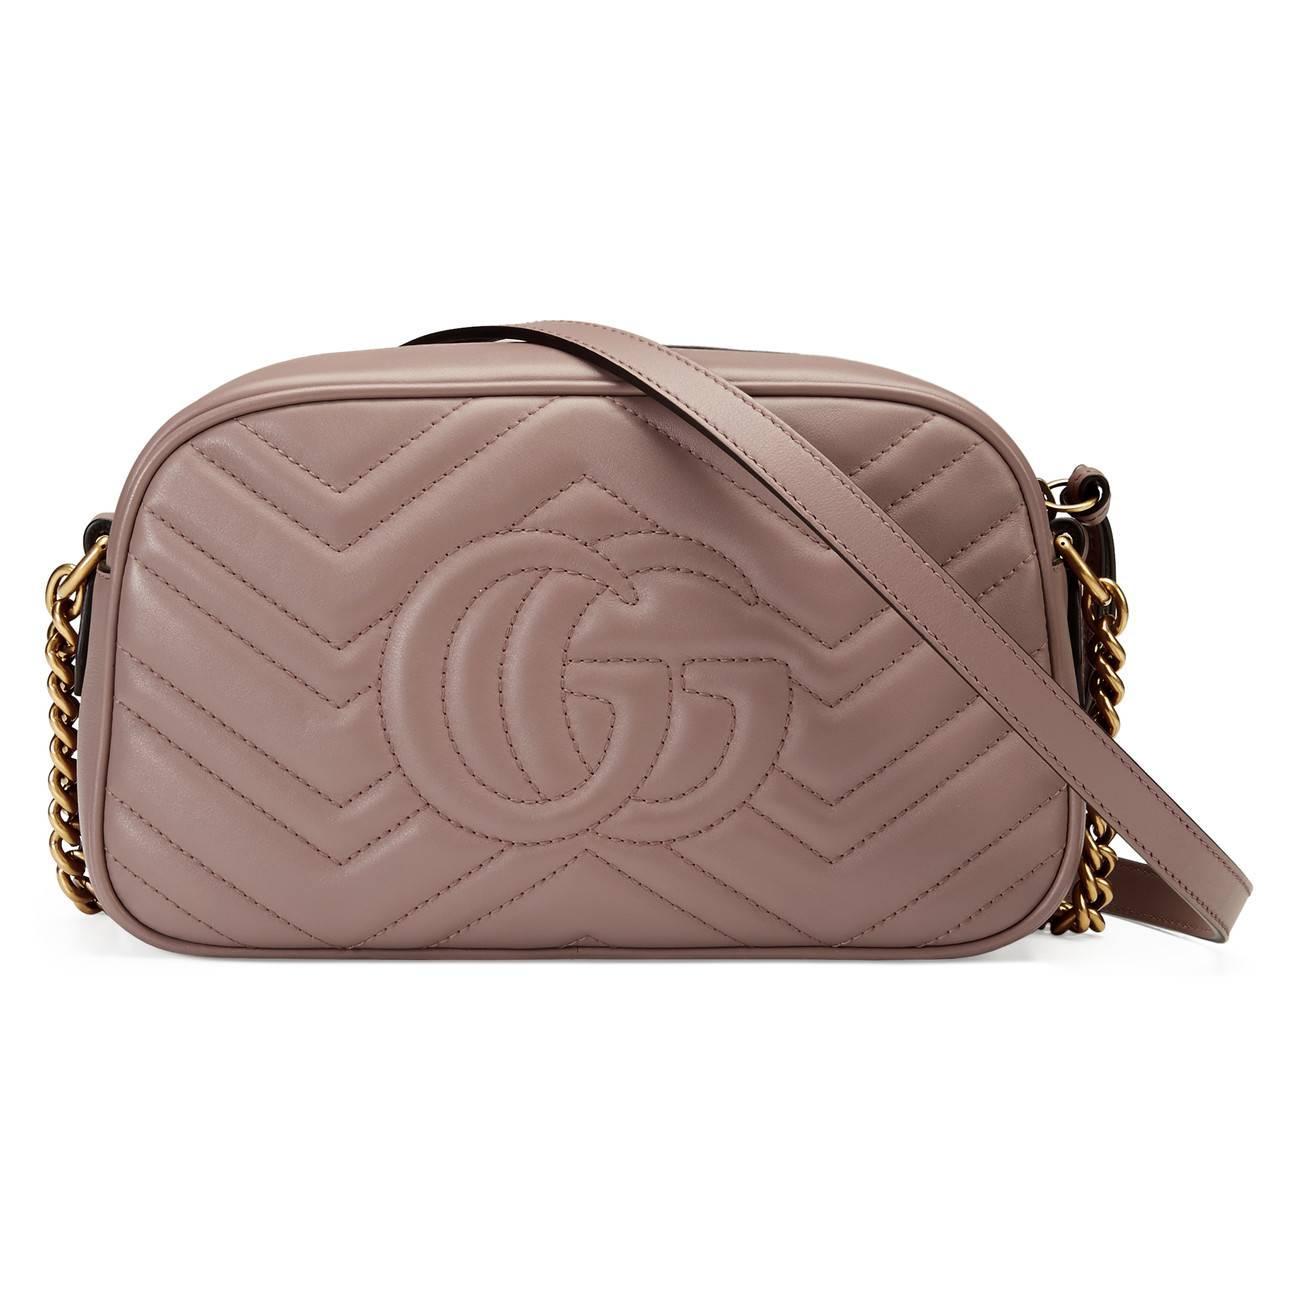 c7e96b46b6a Gucci - Pink GG Marmont Small Matelassé Shoulder Bag - Lyst. View fullscreen